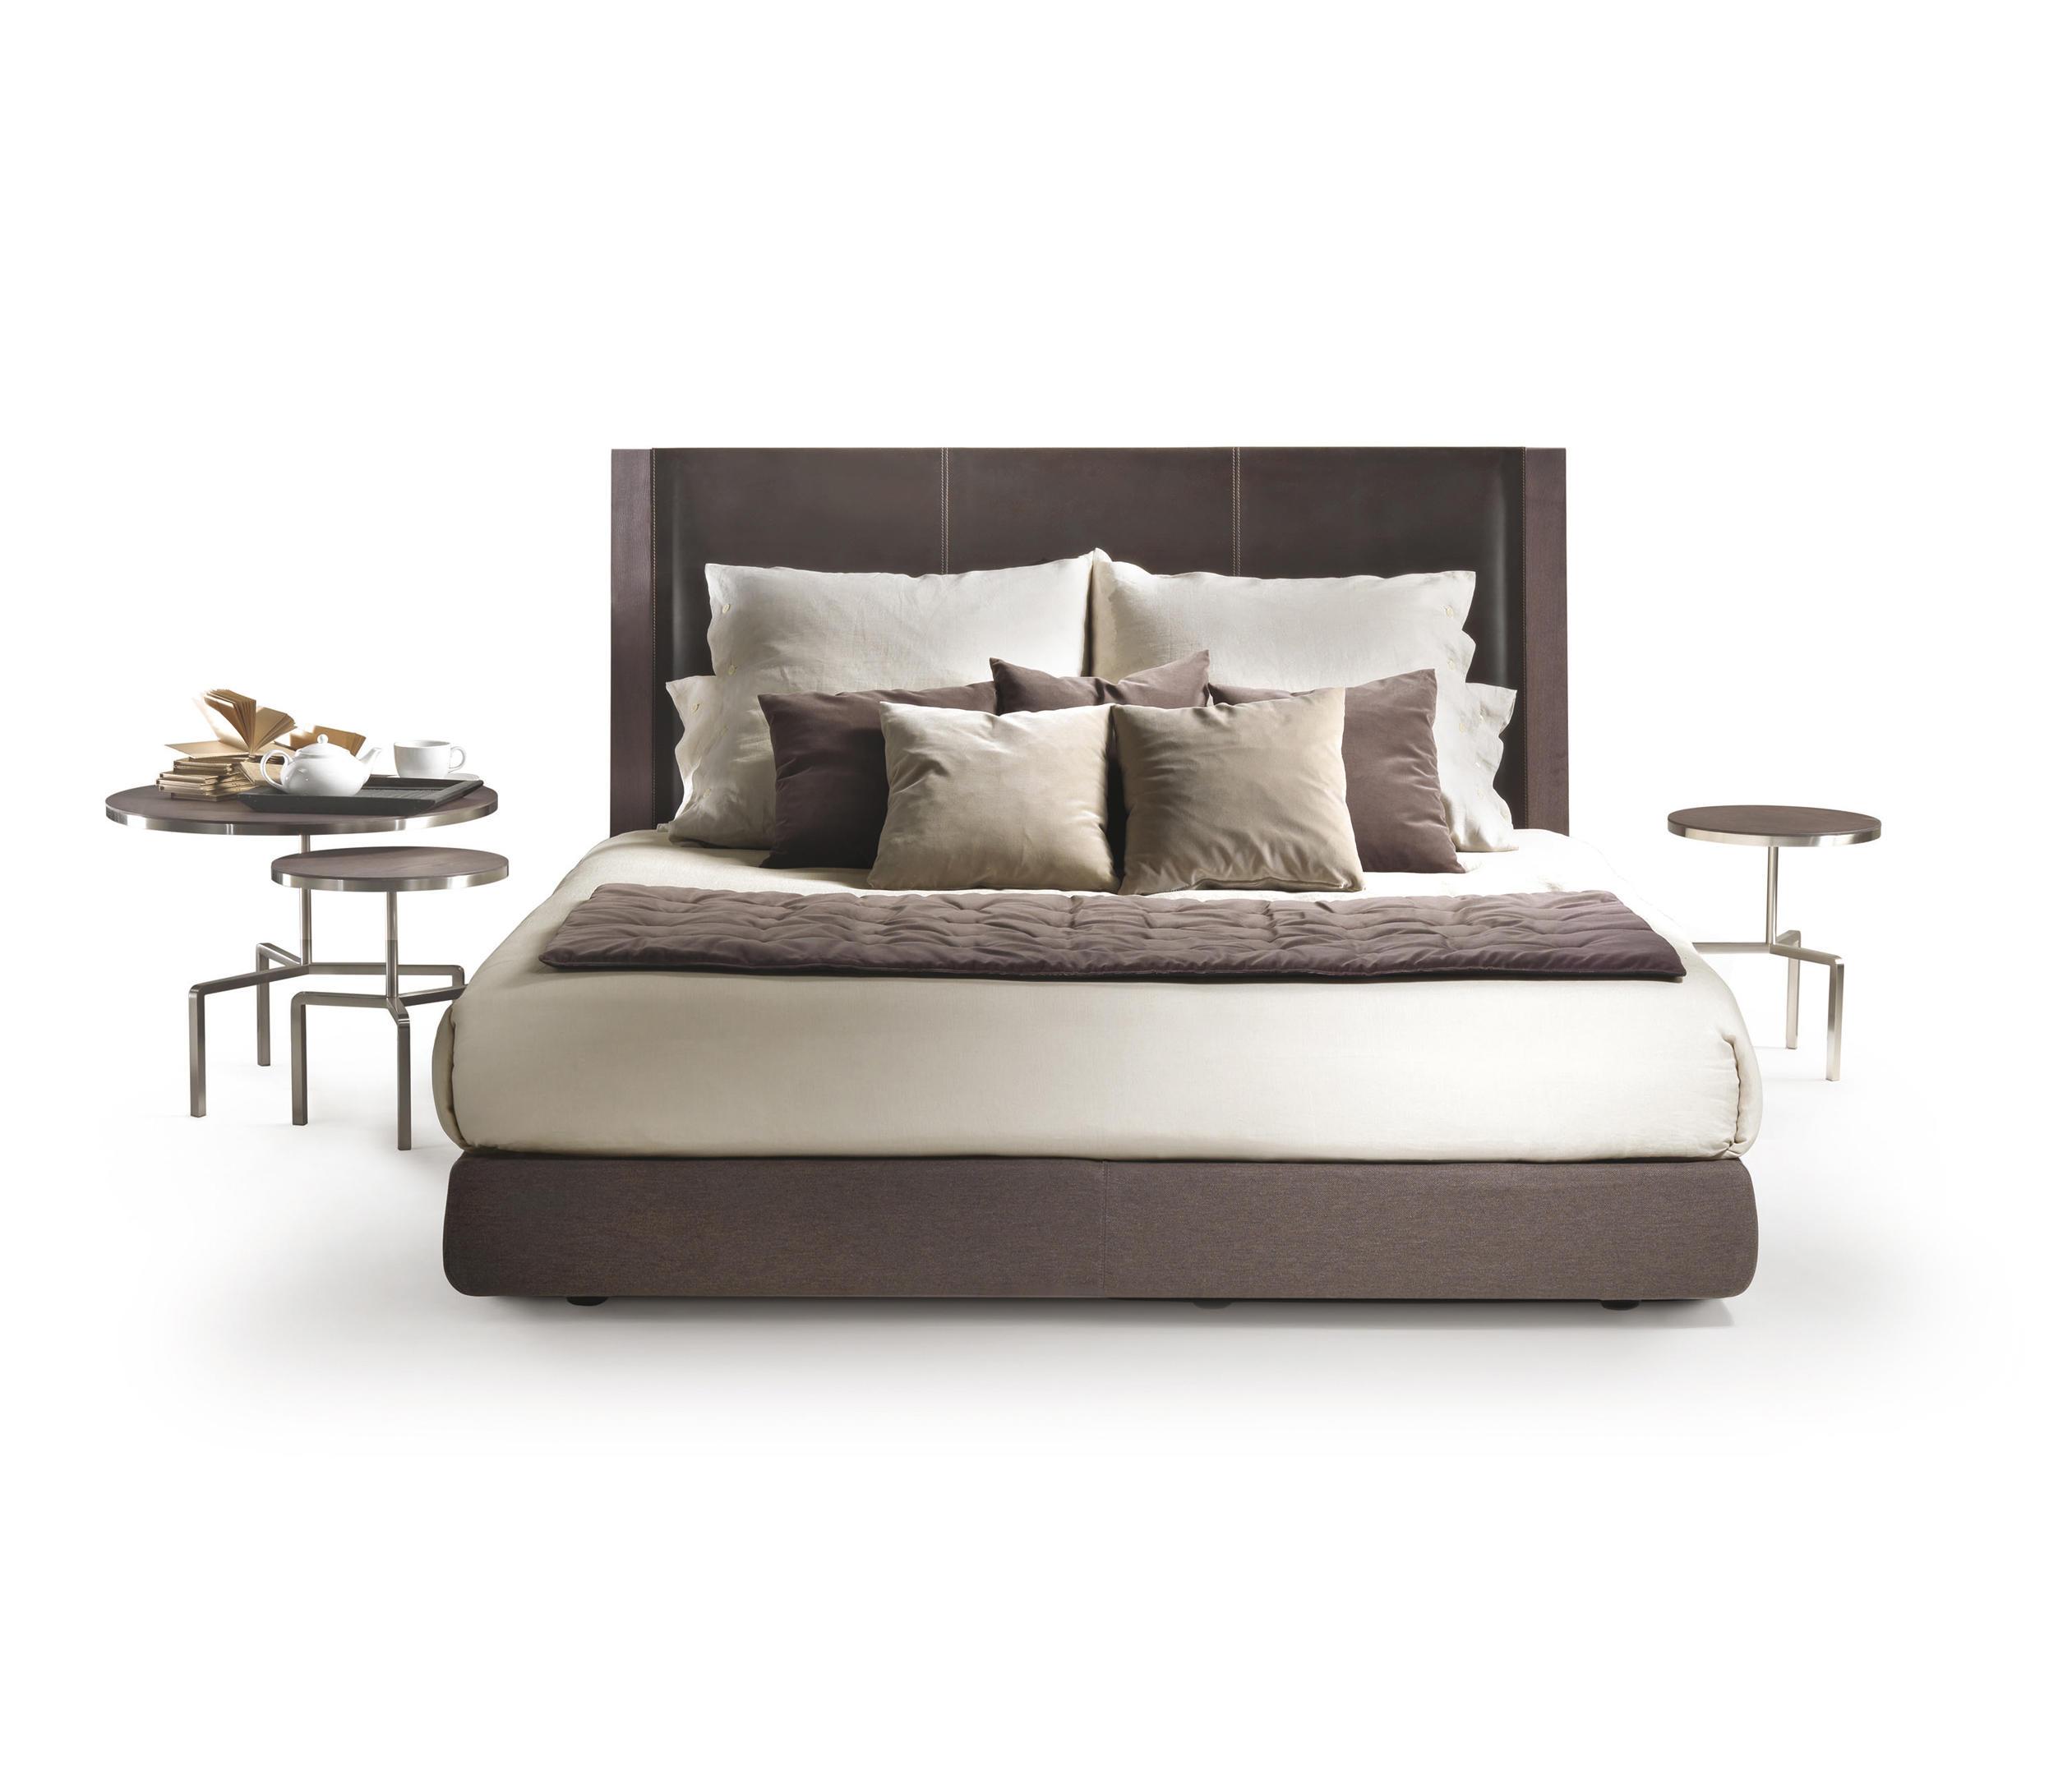 margaret bed lits doubles de flexform architonic. Black Bedroom Furniture Sets. Home Design Ideas